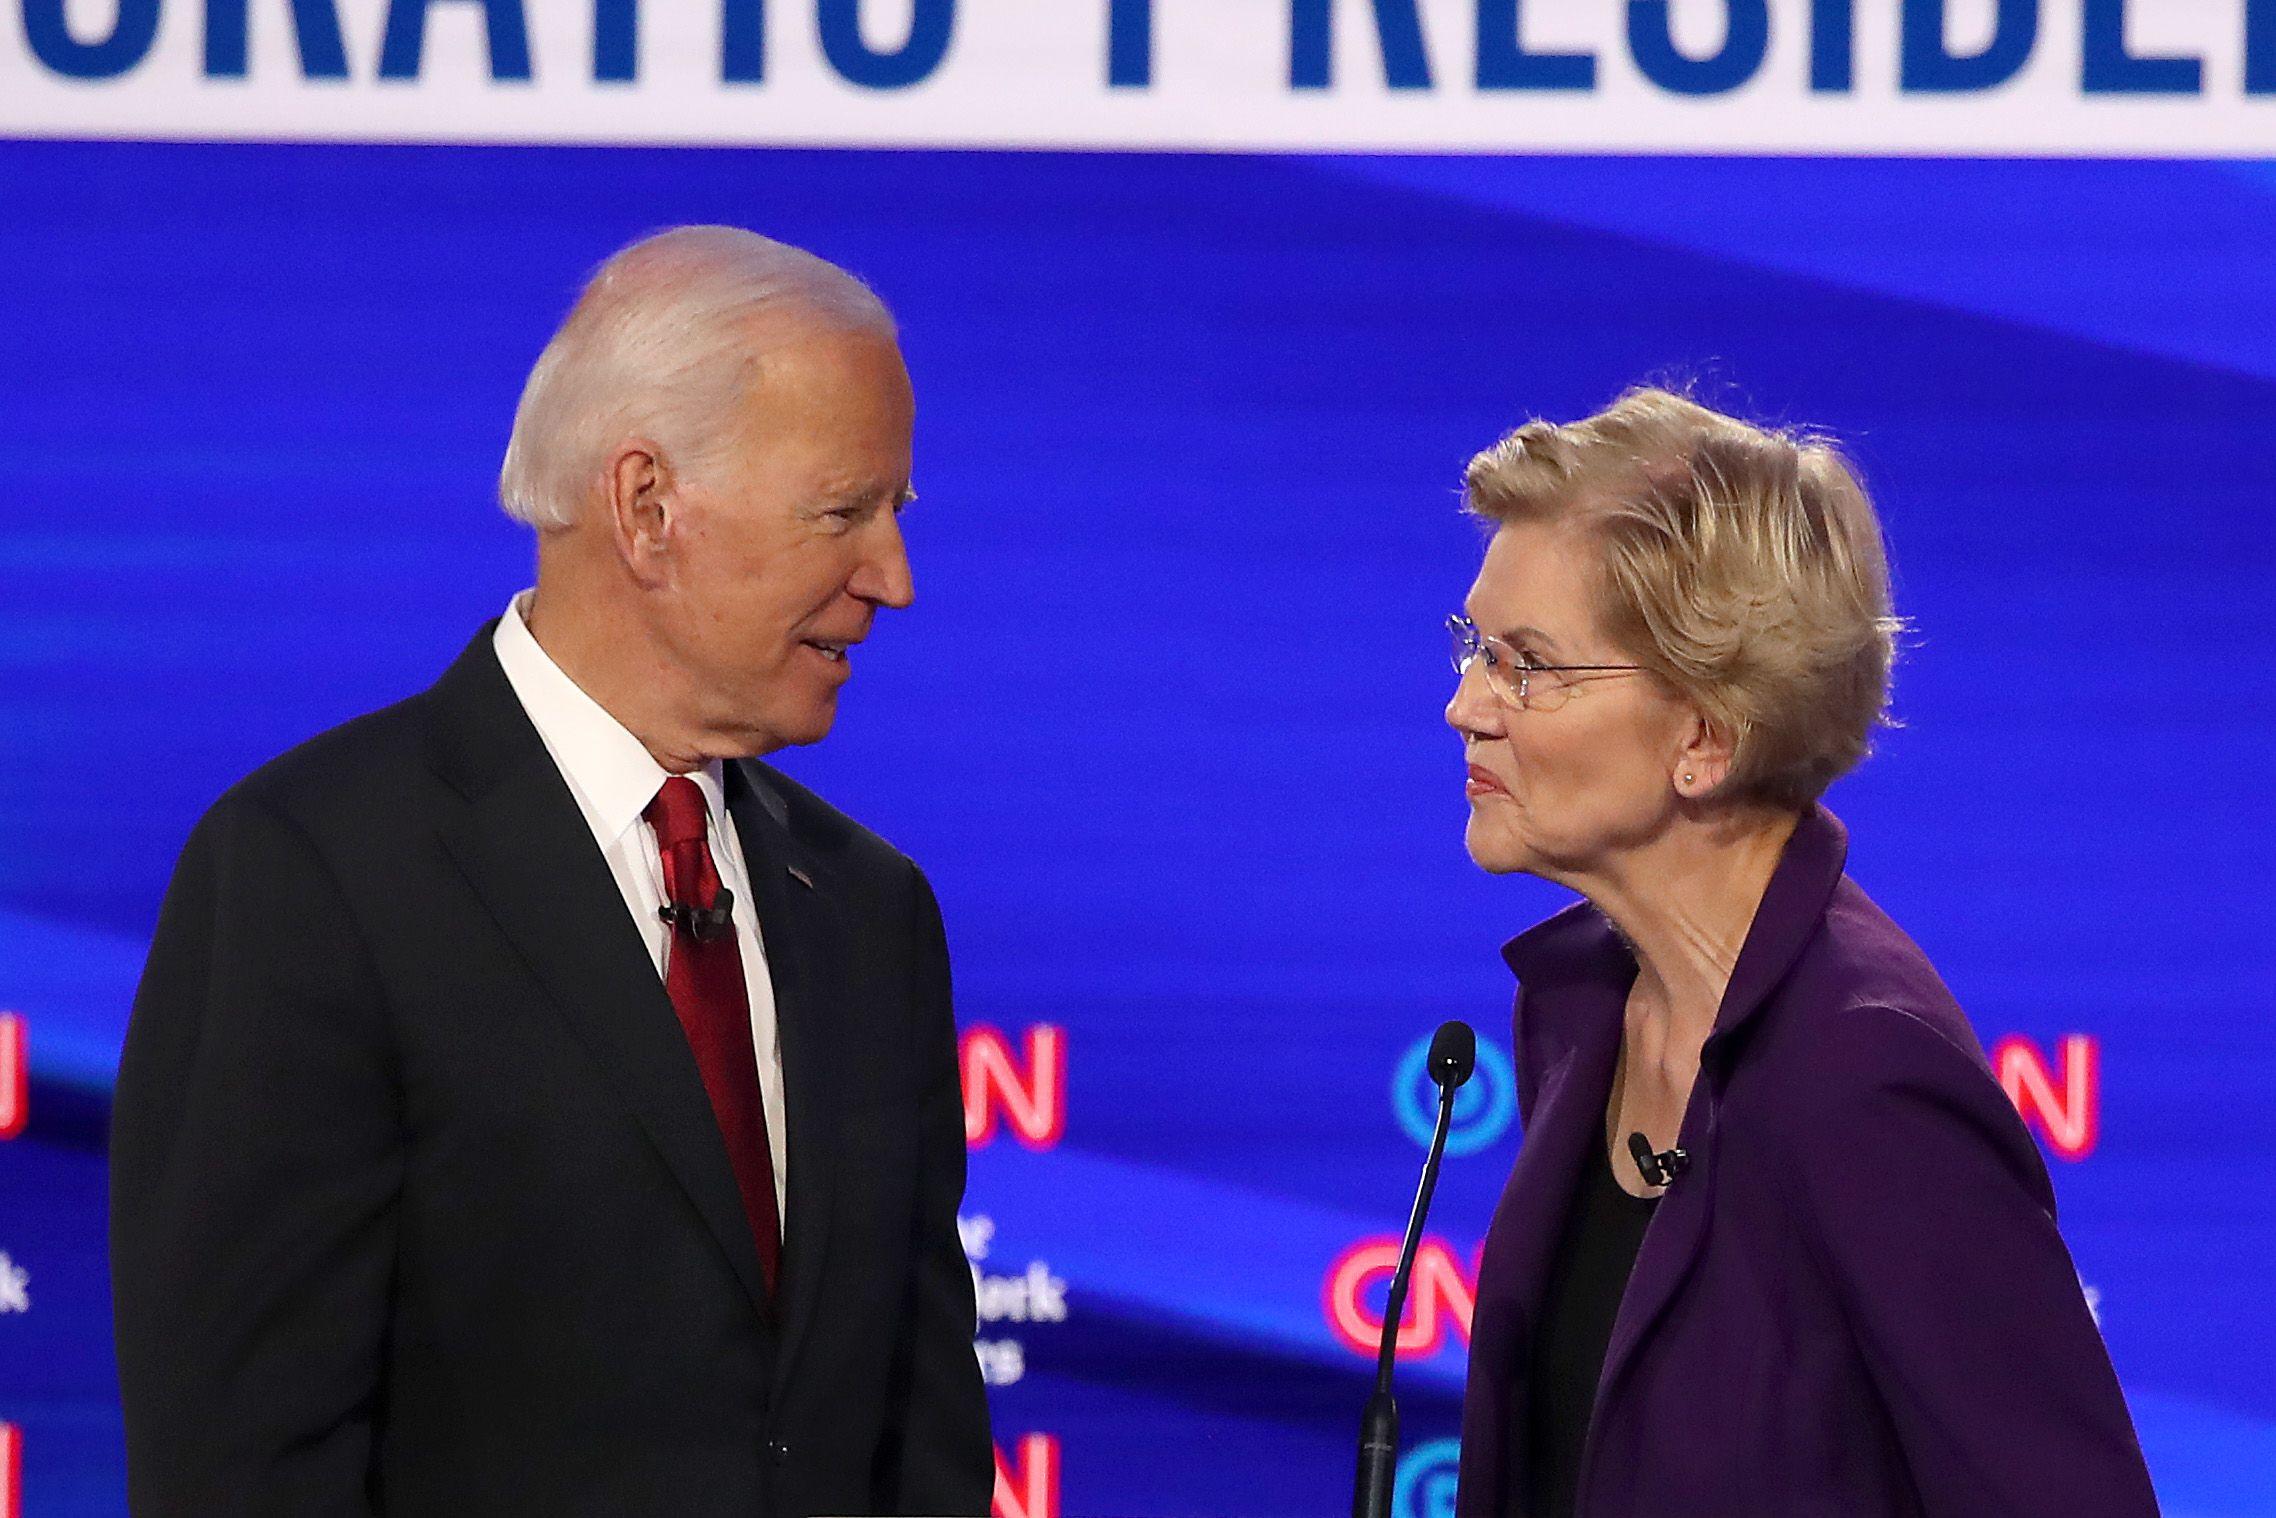 Joe Biden Tried to Take Credit for Elizabeth Warren's Work During the Debate